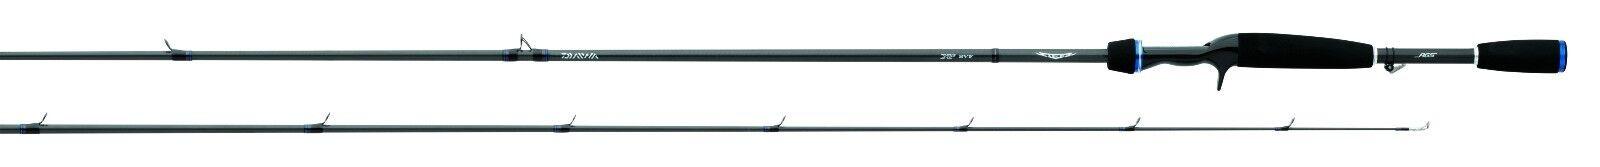 Daiwa Steez AGS Graphite Casting 7'4  Fast Frog Fishing Rod - STZ741XHFB-AGS